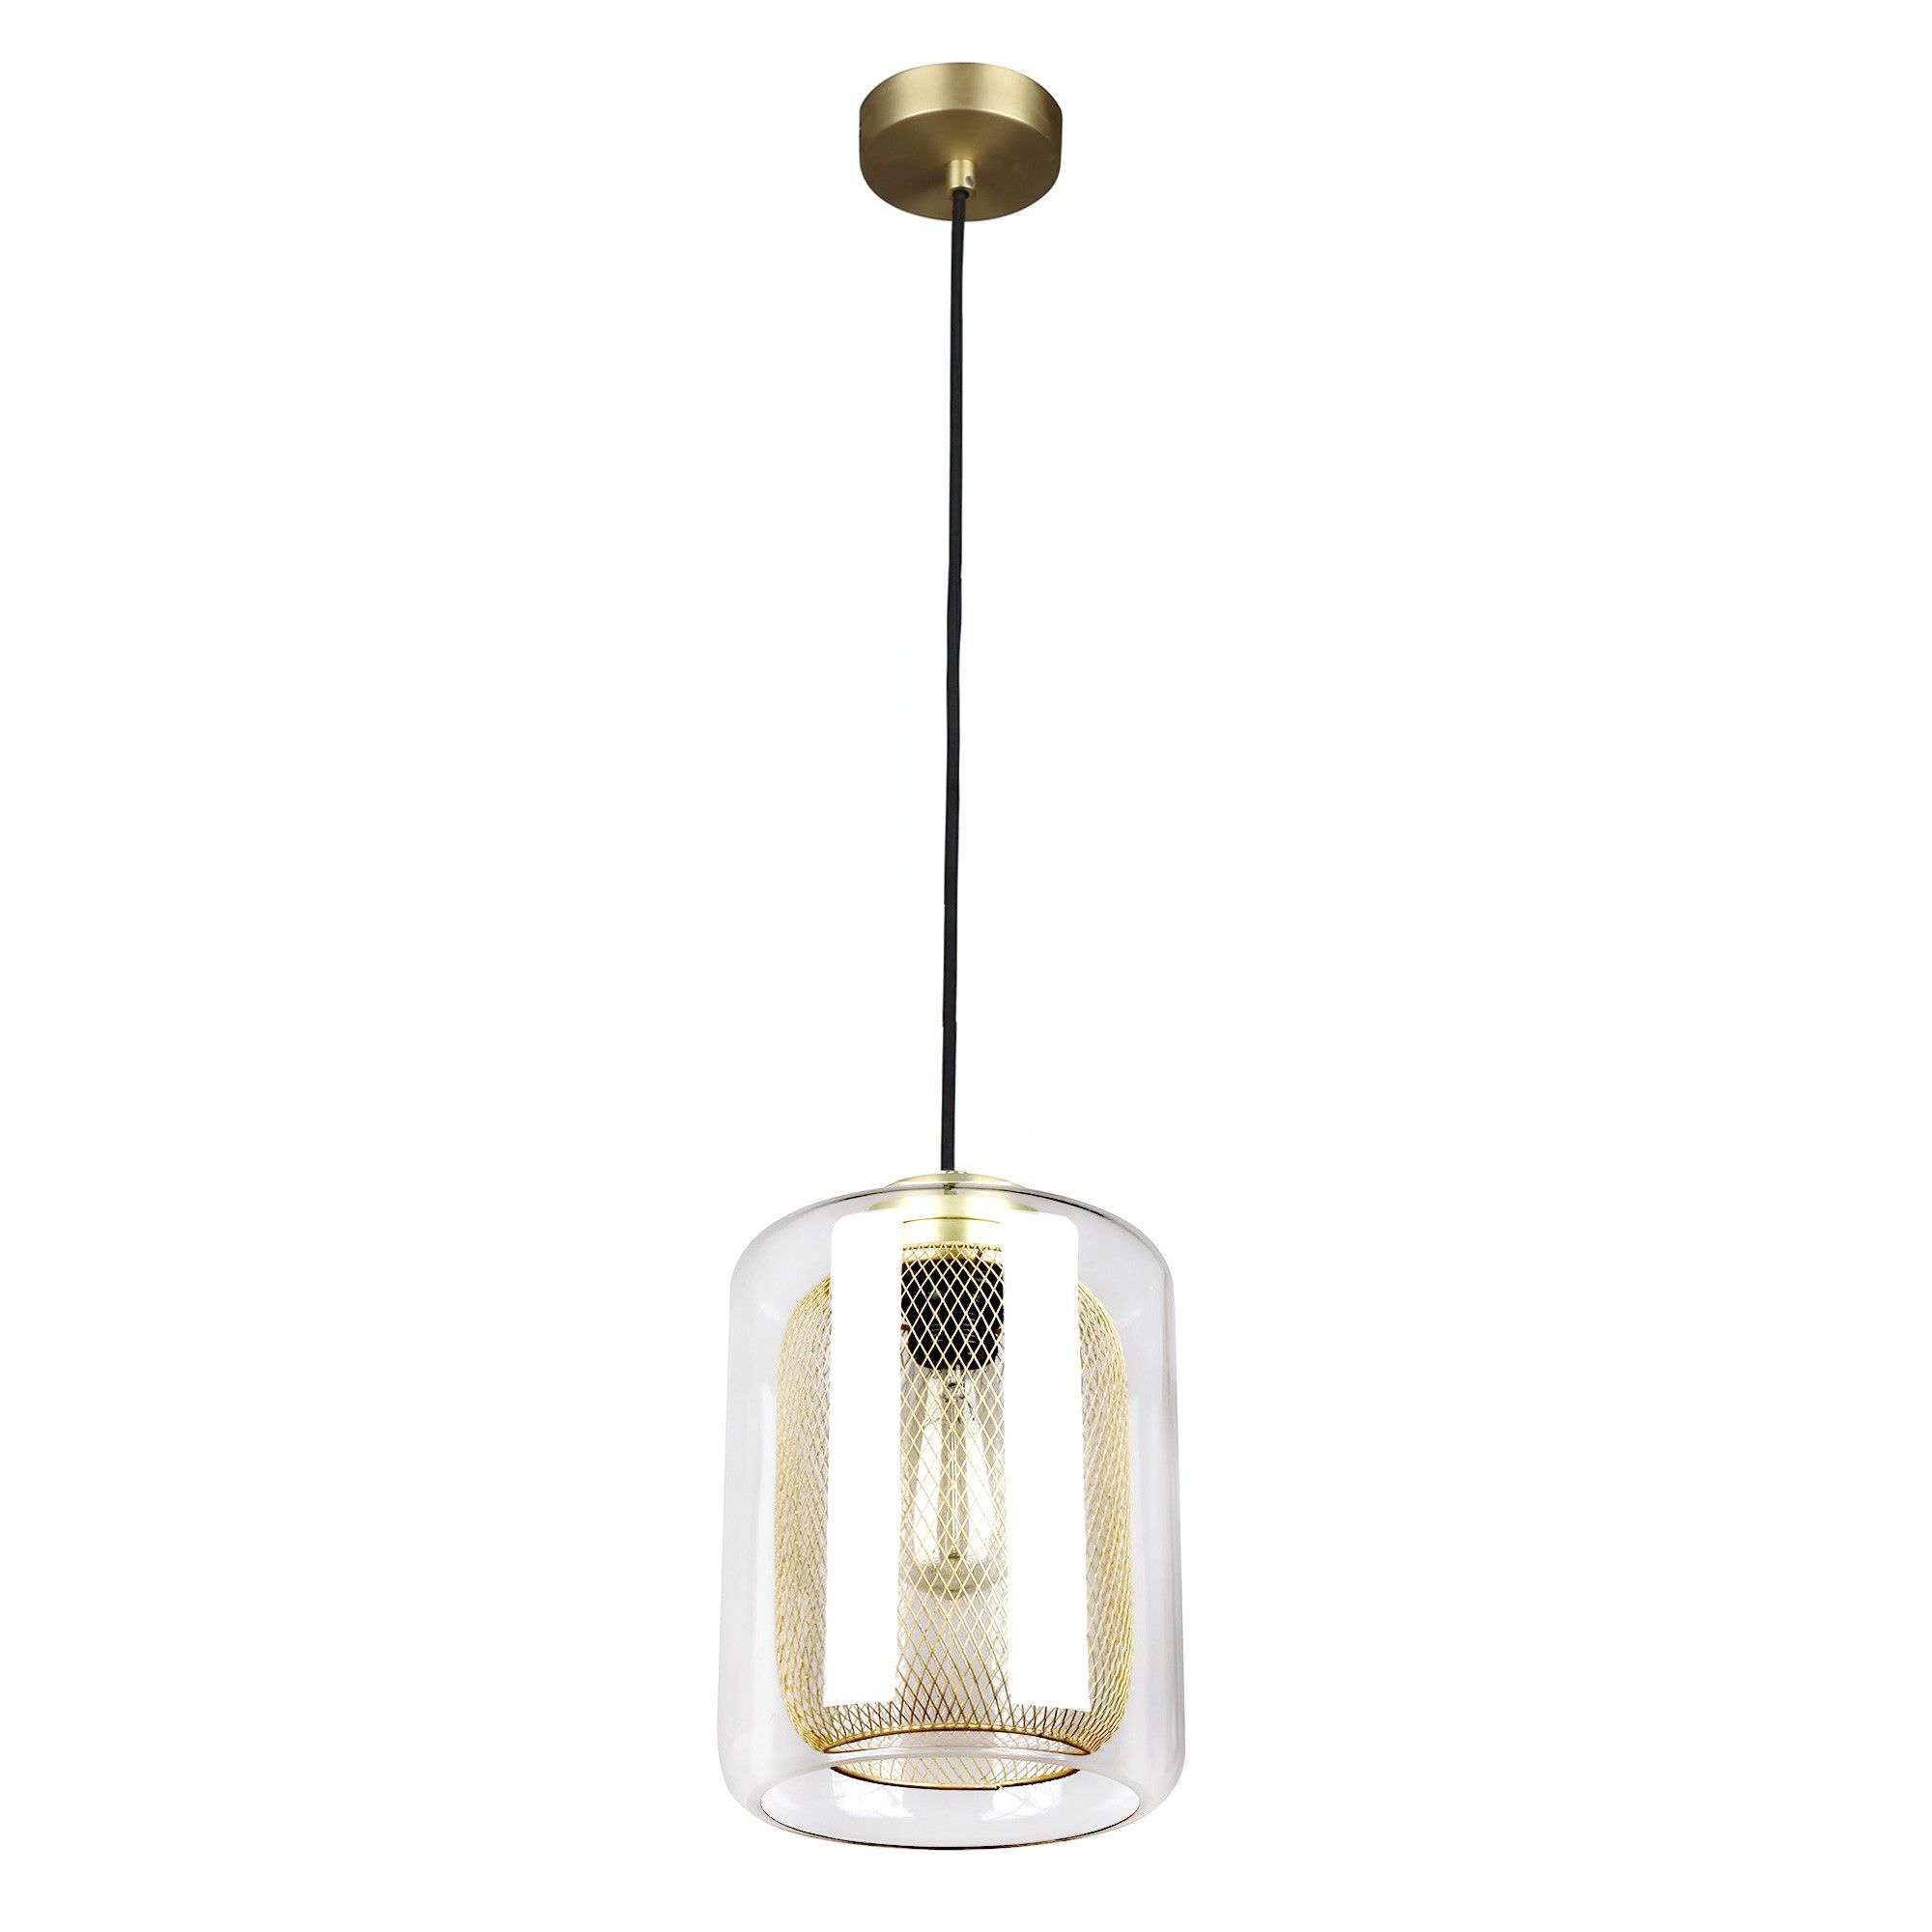 Tono Glass & Iron Mesh Pendant Light, Brass